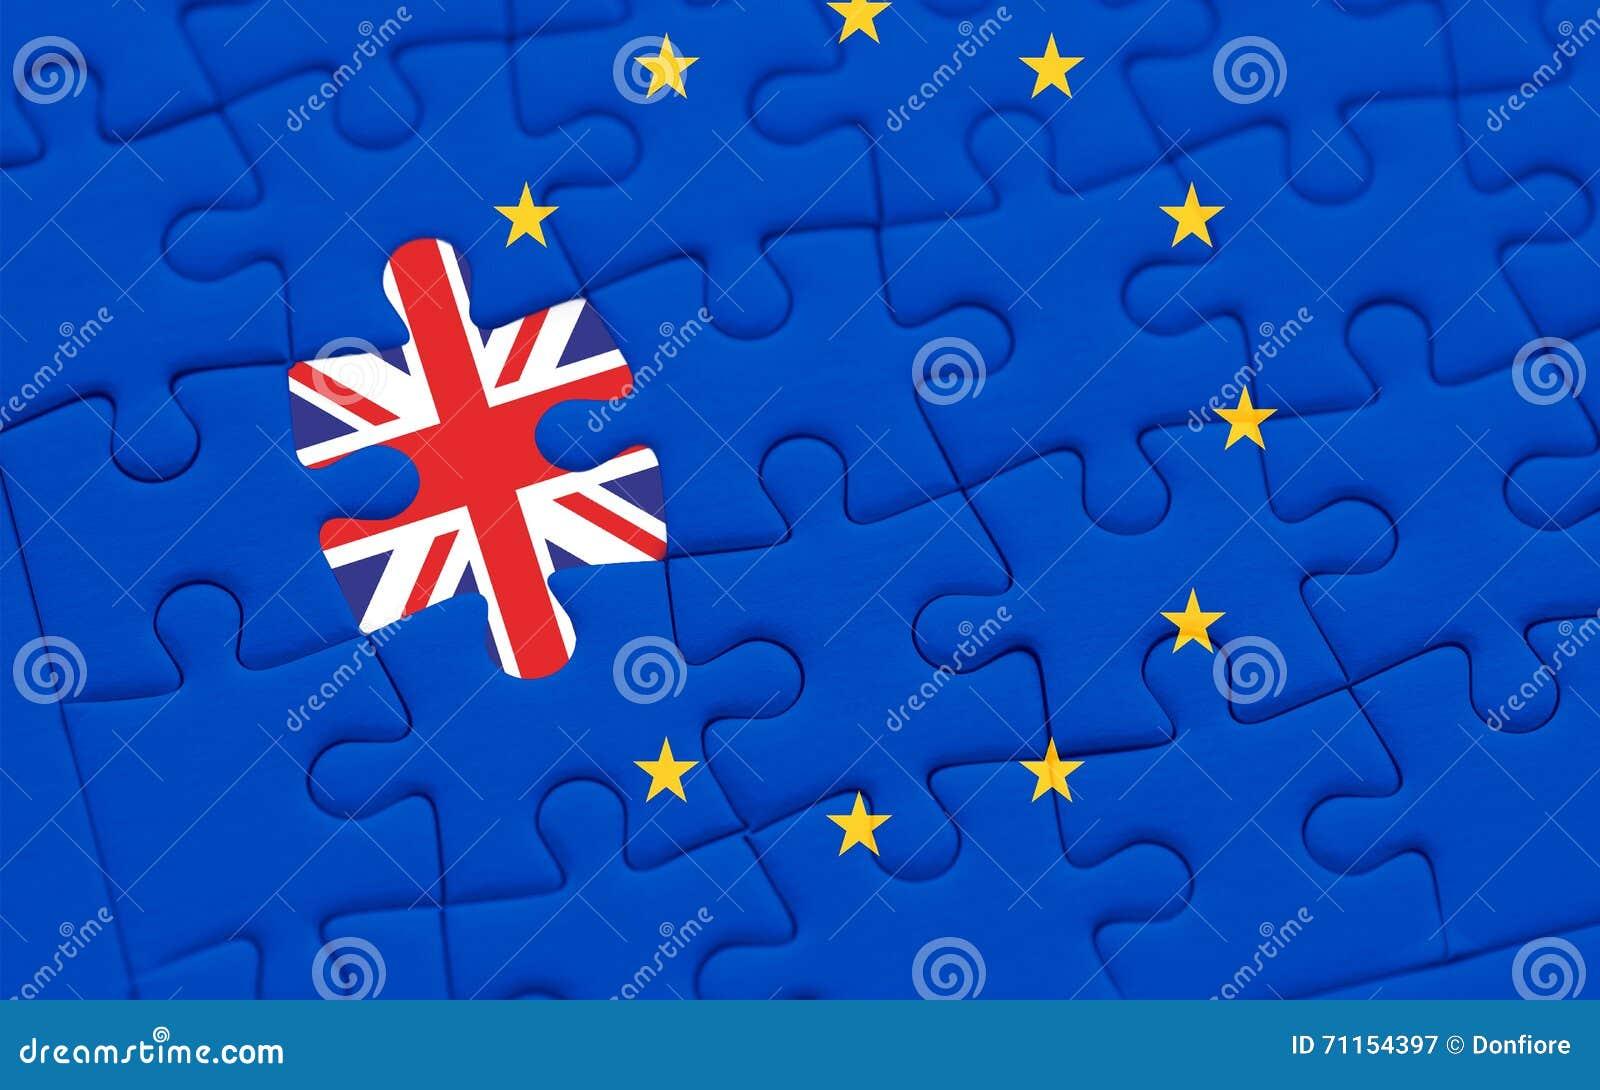 Brexit blue european union EU flag puzzle with puzzle piece with great britain flag